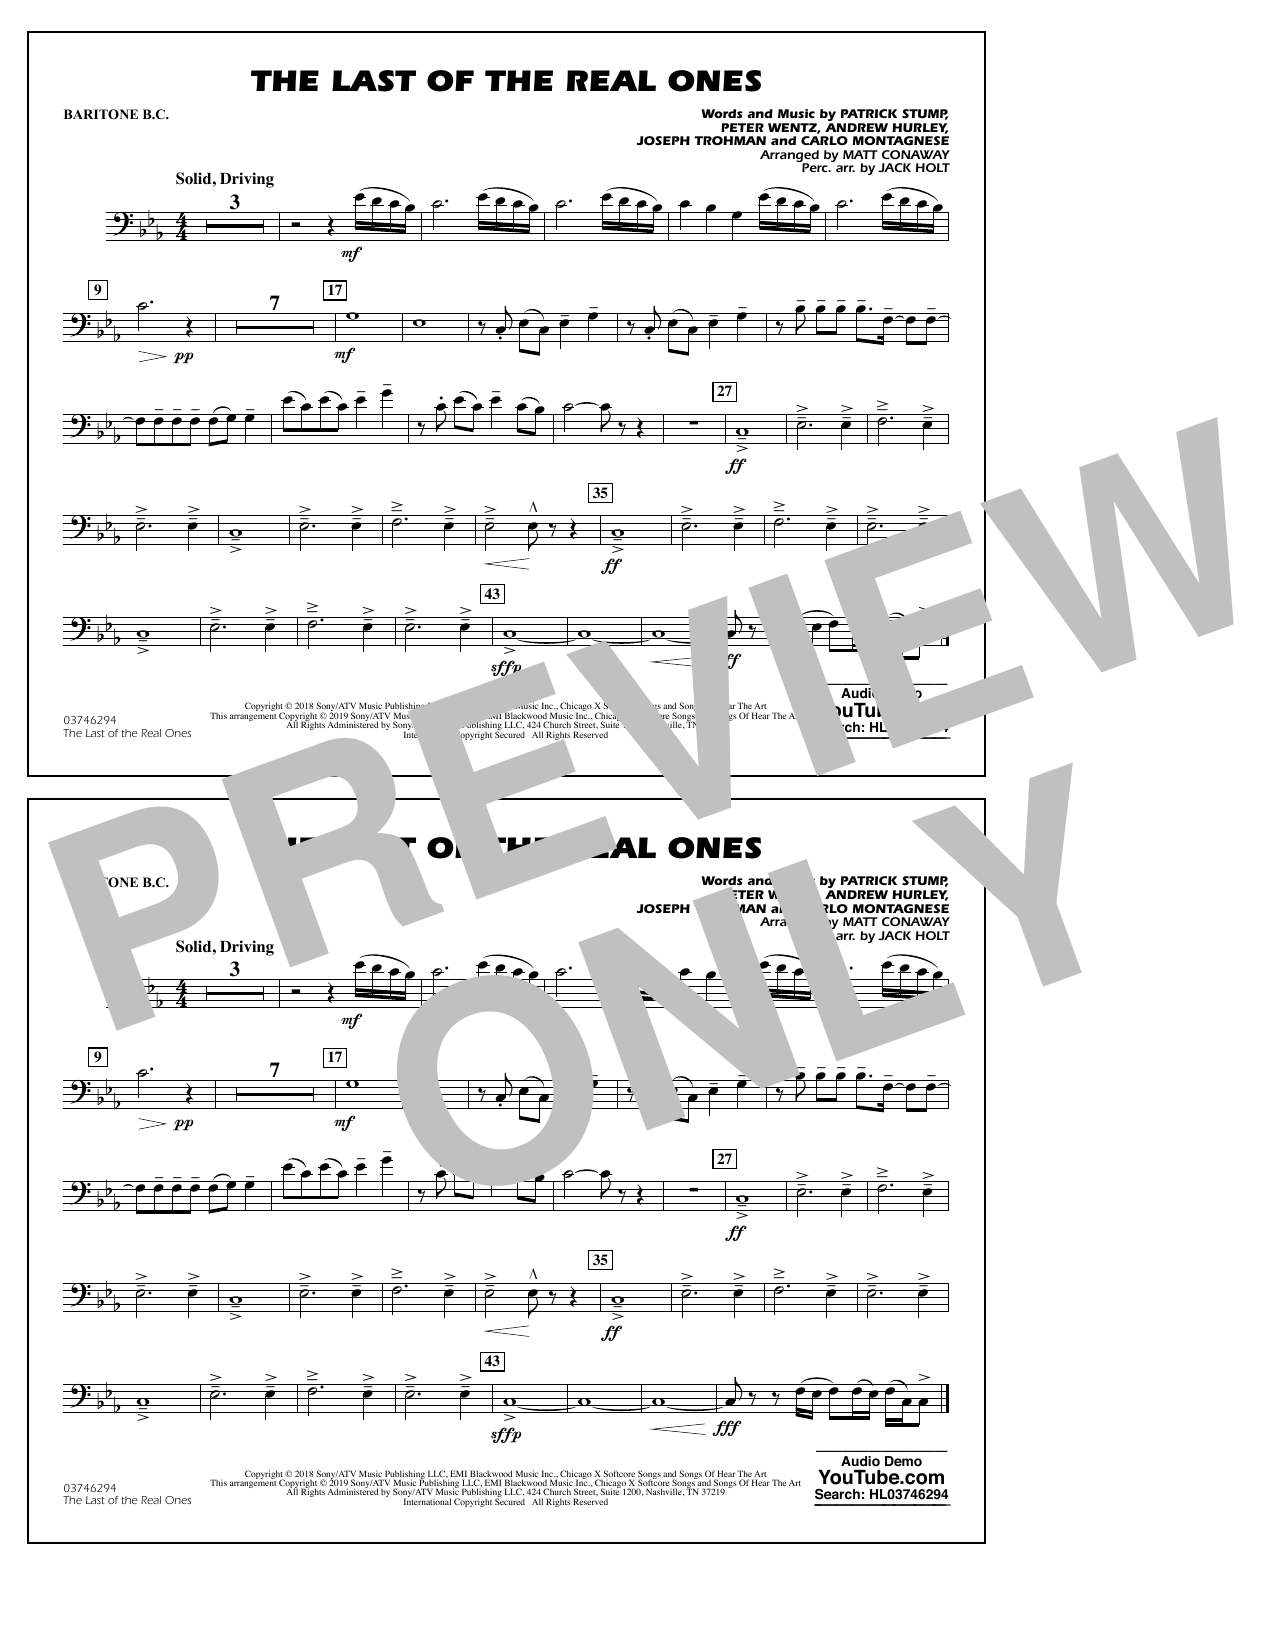 Last of the Real Ones (arr. Matt Conaway) - Baritone B.C. (Marching Band)